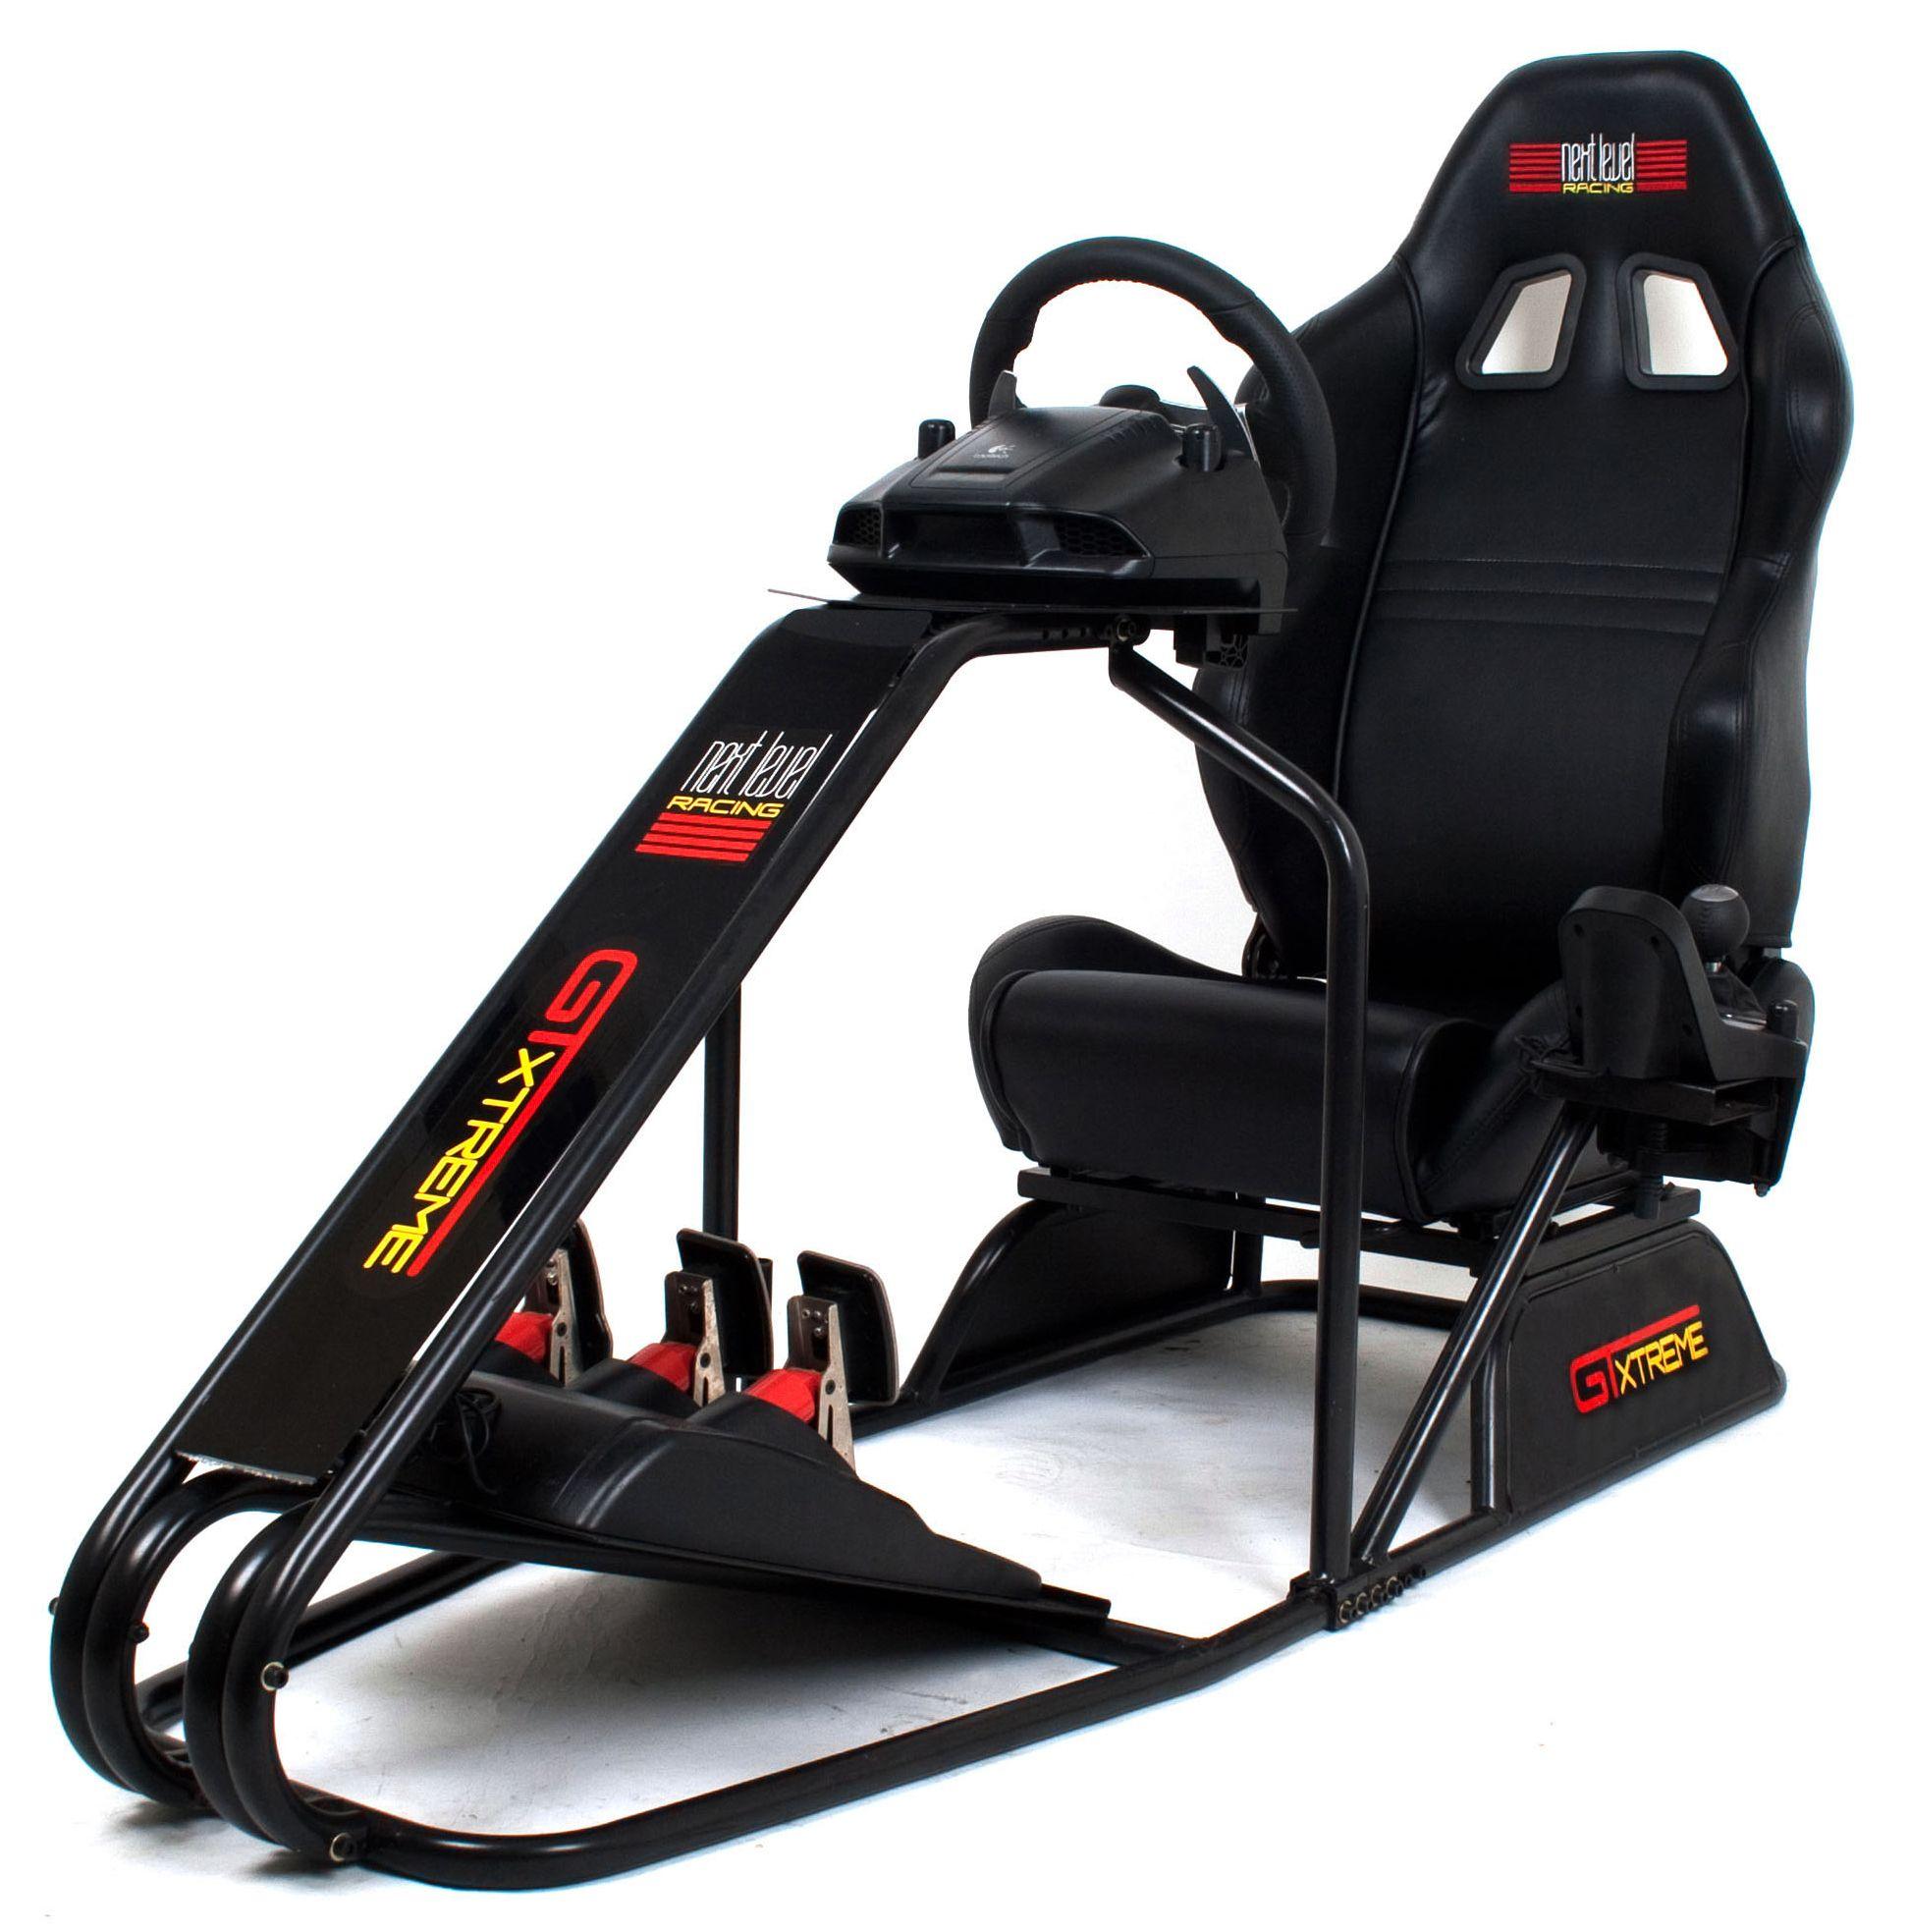 Next Level GTxtreme Racing Simulator BOYS WANT TOYS